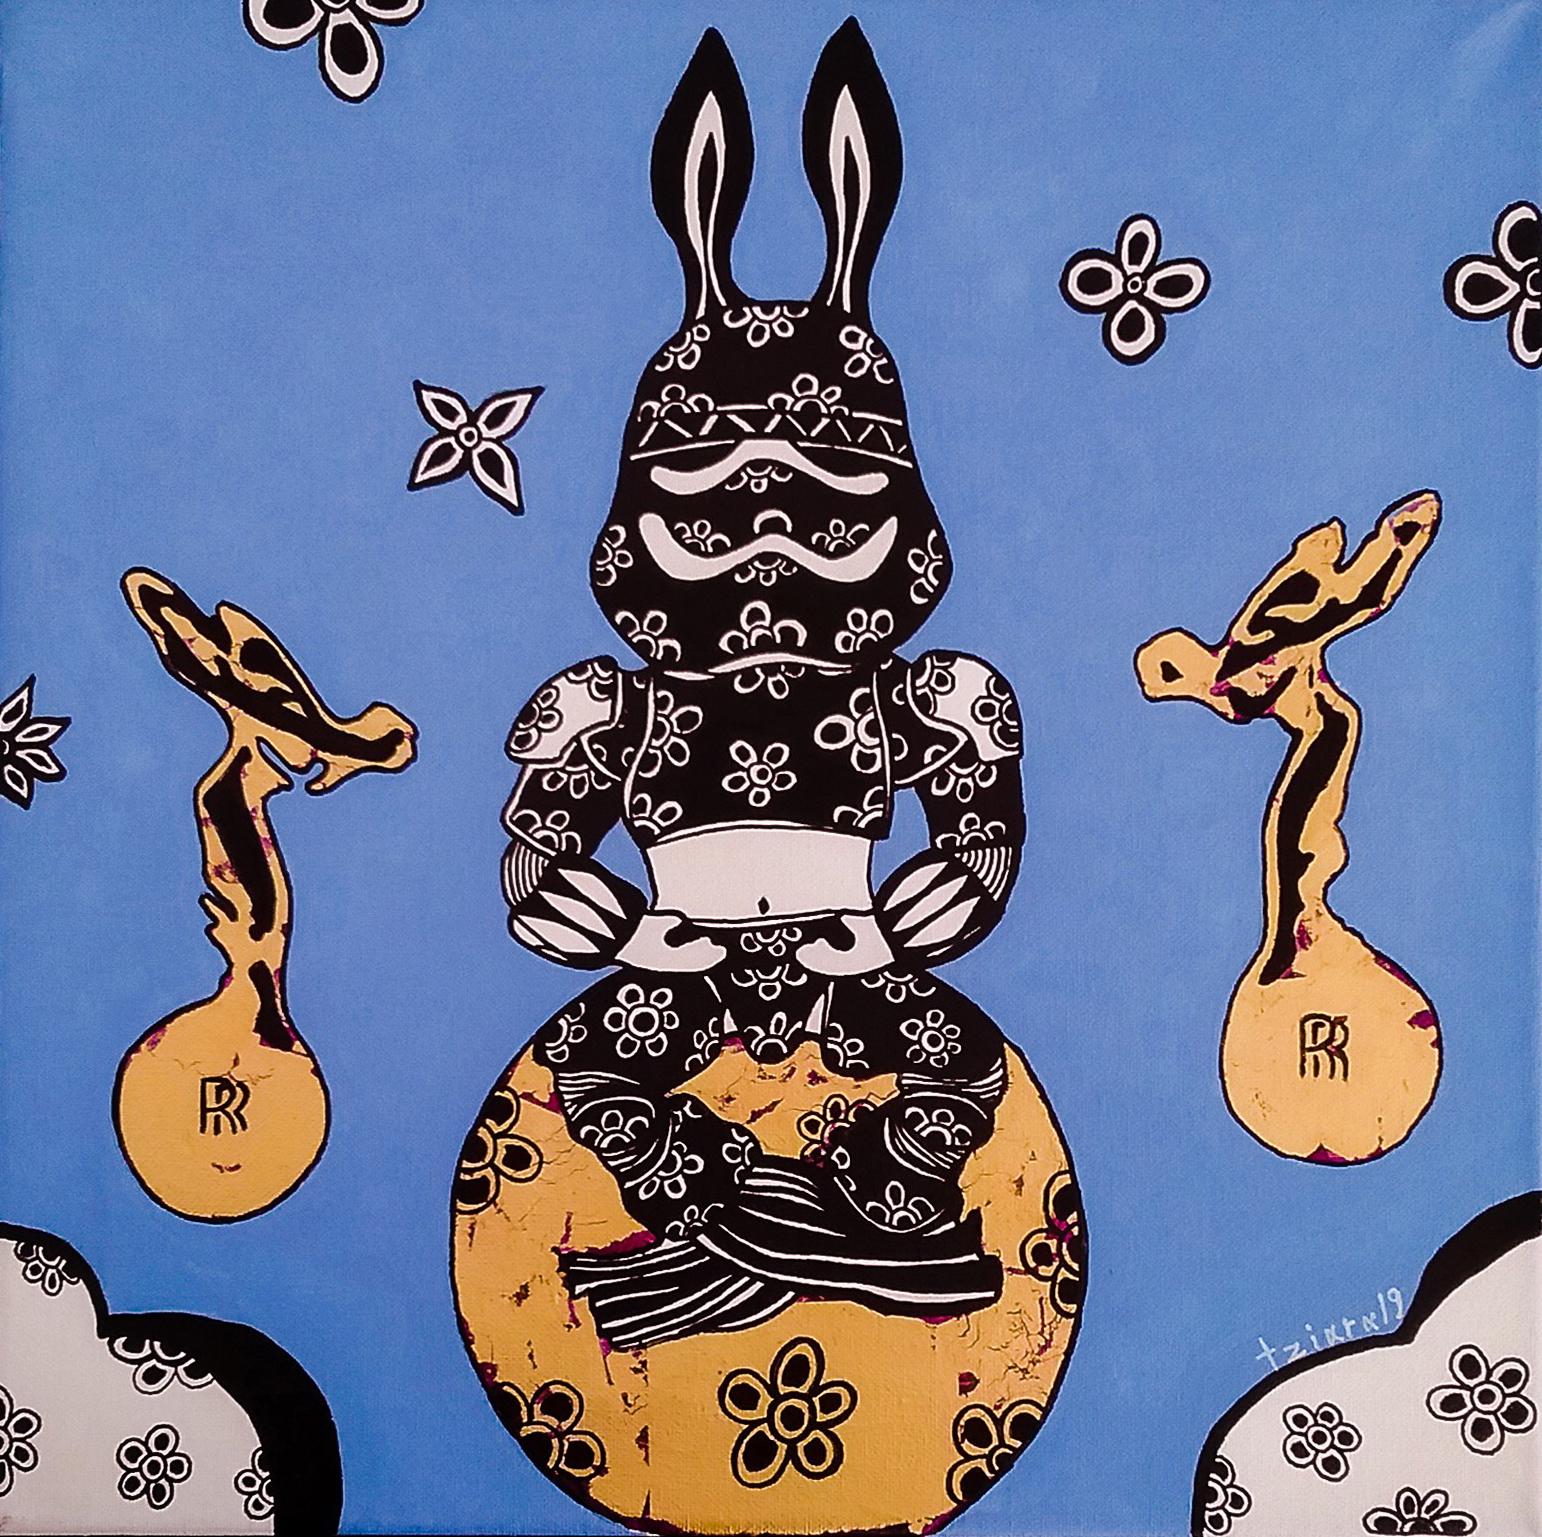 The Space Rabbit meditating 1